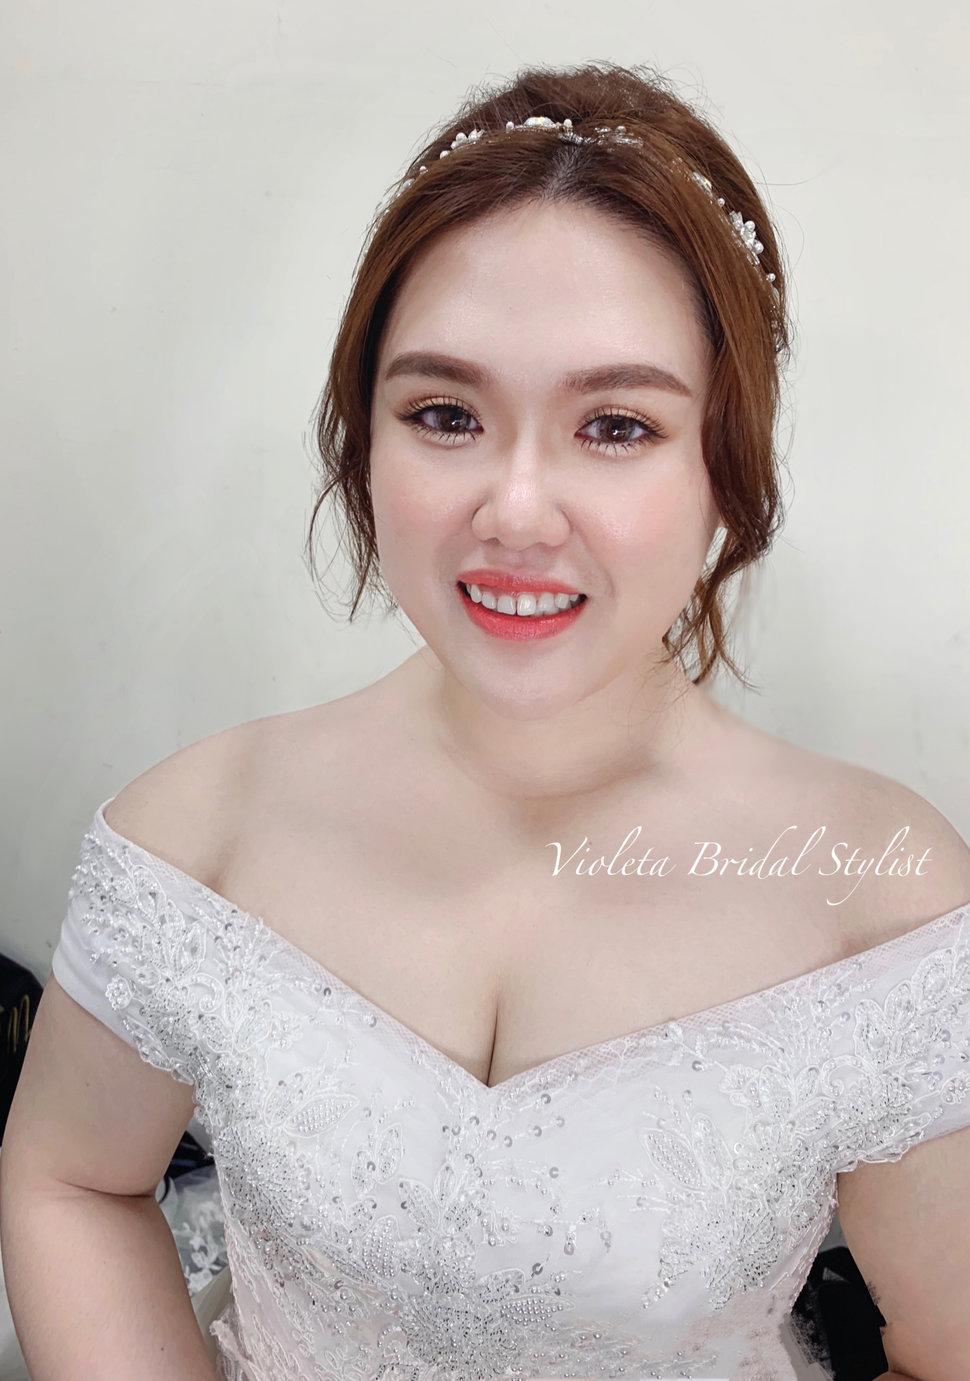 97D690DD-8ED9-4A60-B314-13642C67D01F - 台中/台新秘可可 精緻彩妝 新娘整體造型 - 結婚吧